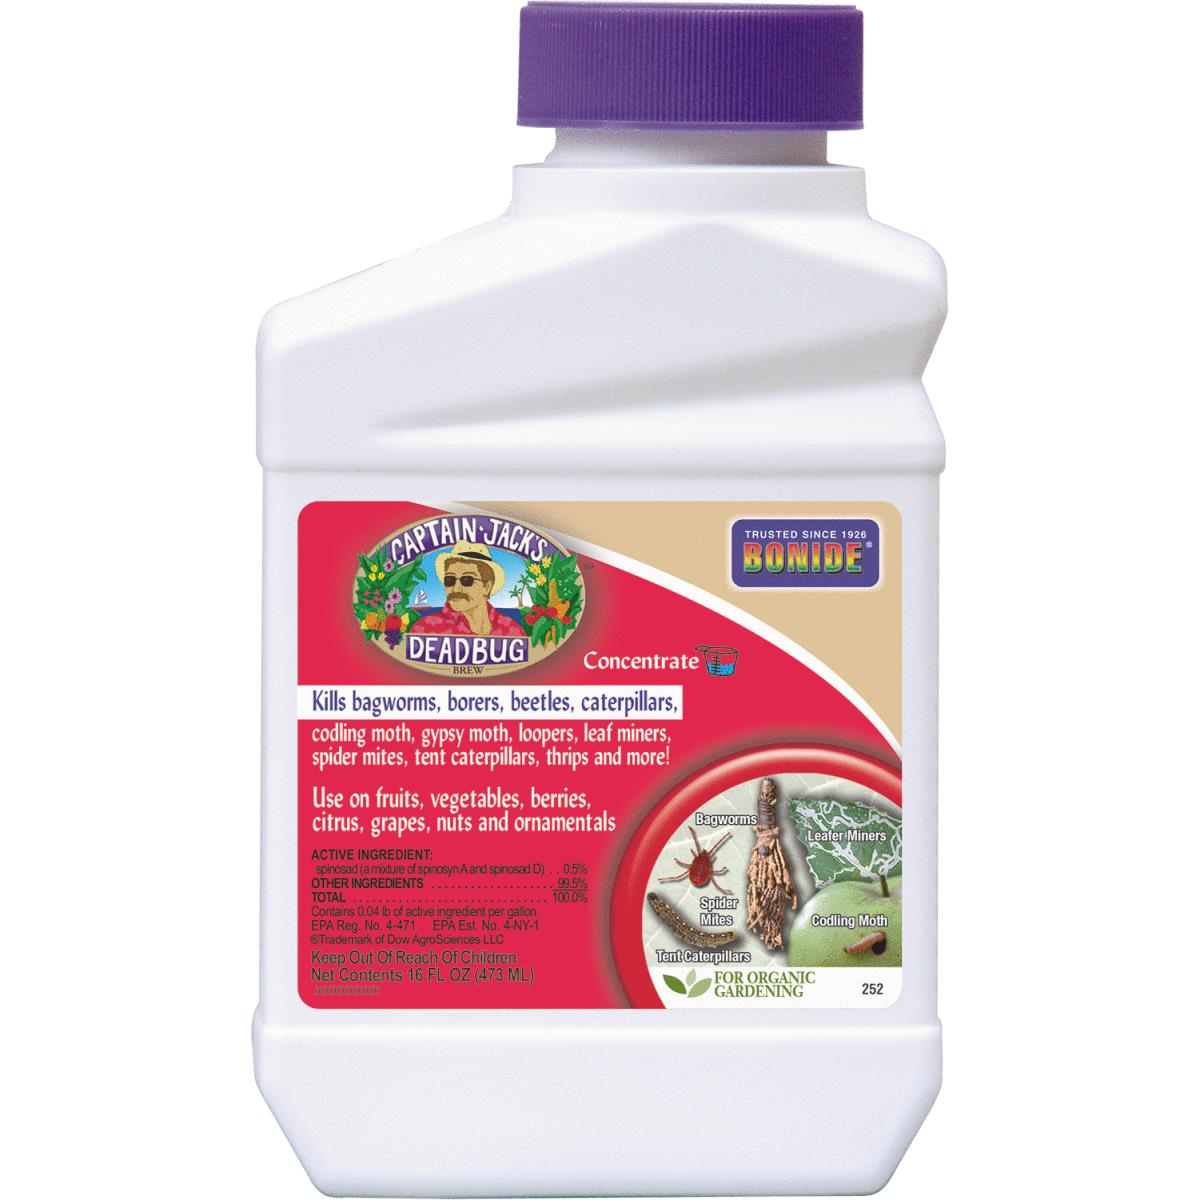 Bonide Captain Jack's Deadbug Brew Insect Killer 16 Oz , Pourable